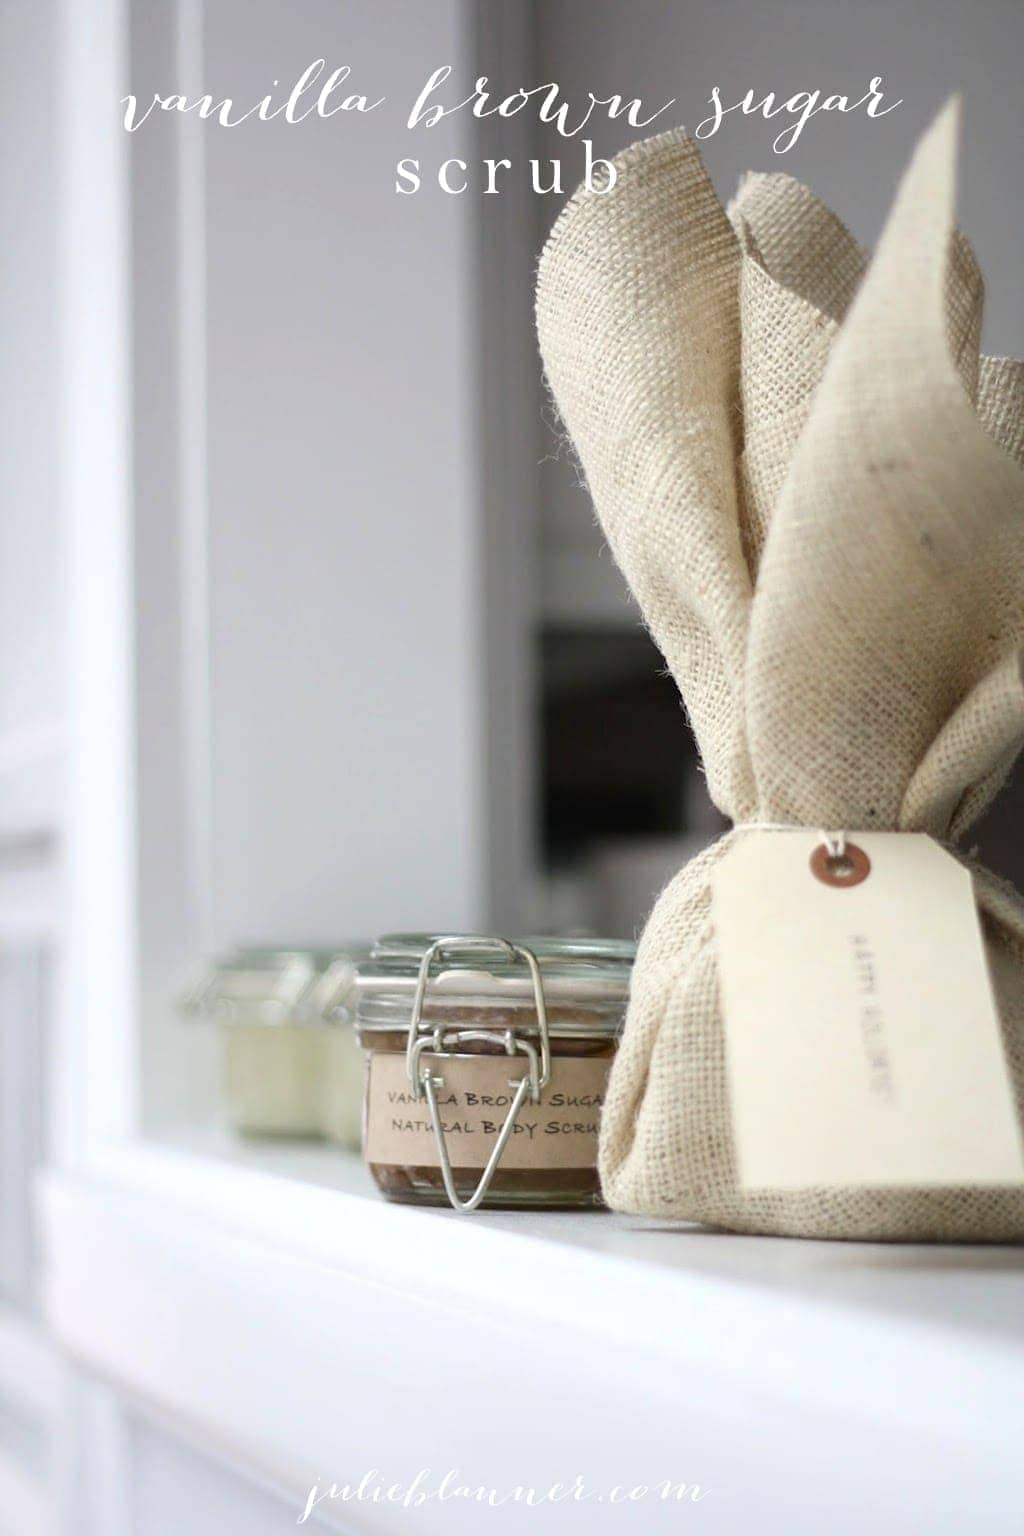 Easy homemade sugar scrub recipe - all natural Vanilla Brown Sugar Scrub with free printable labels. Great Christmas gift idea!